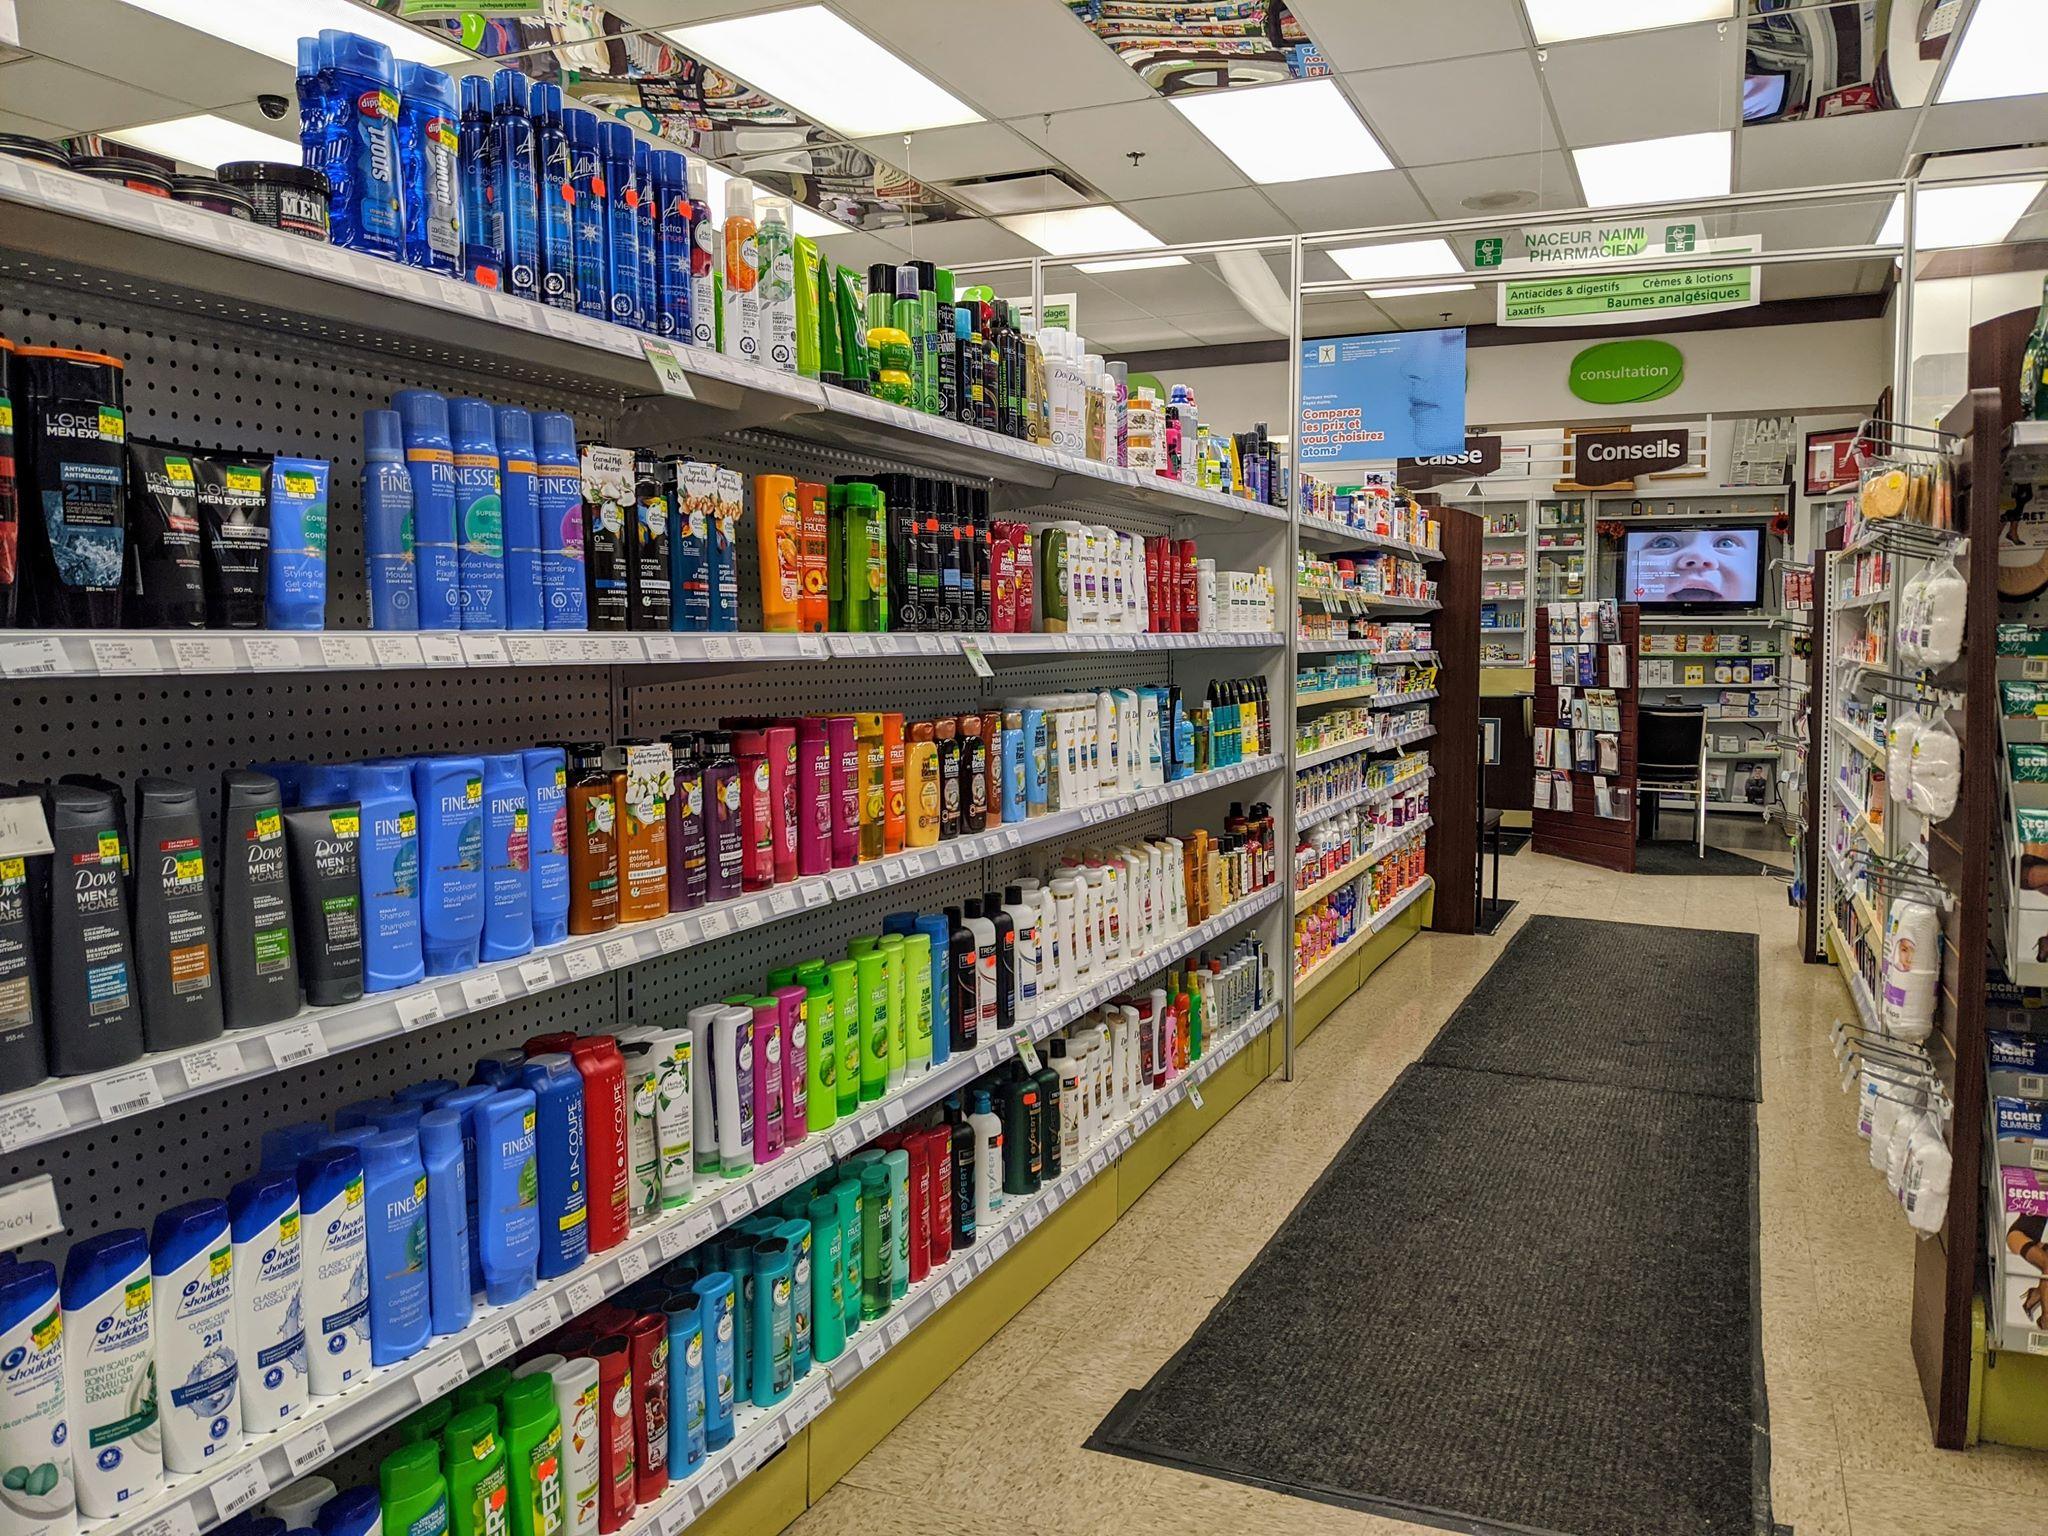 Circulaire et promotions | Proxim – Pharmacie Naimi